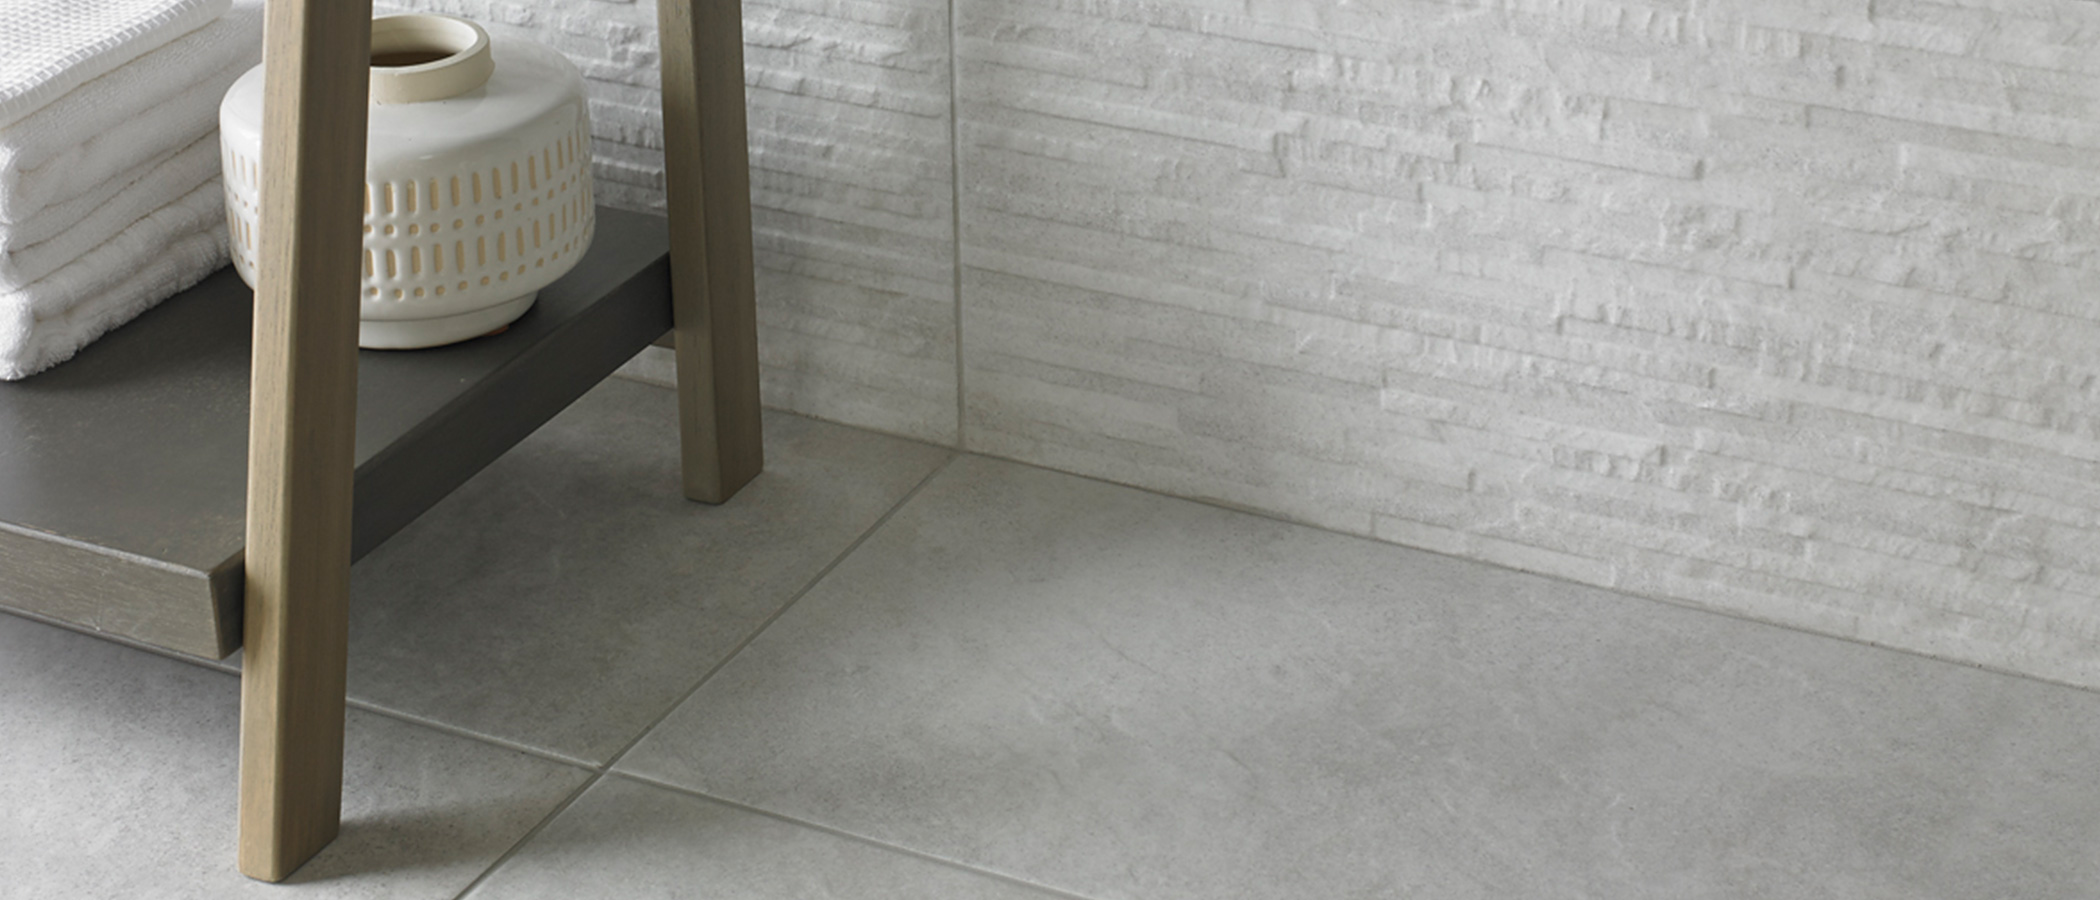 Style inspiration british ceramic tile trend edit dailygadgetfo Choice Image